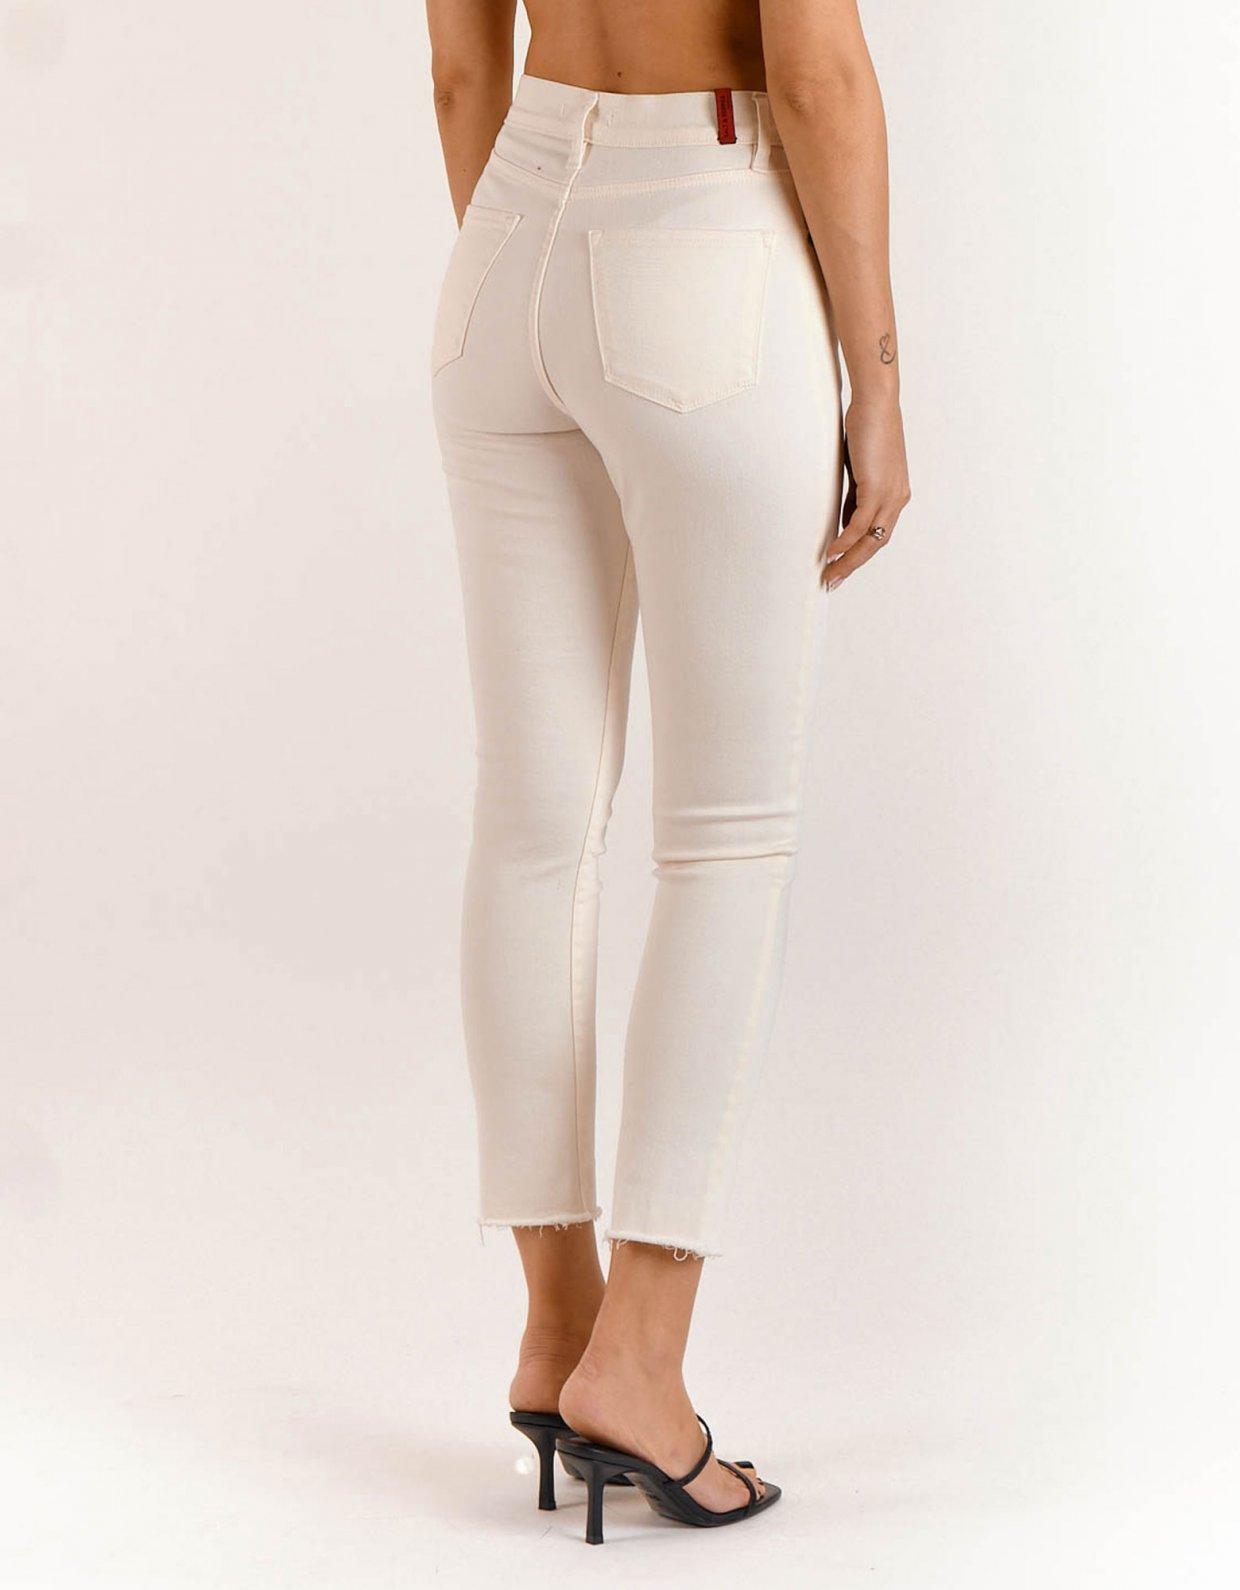 Salt & Pepper Kate off-white cropped denim pants